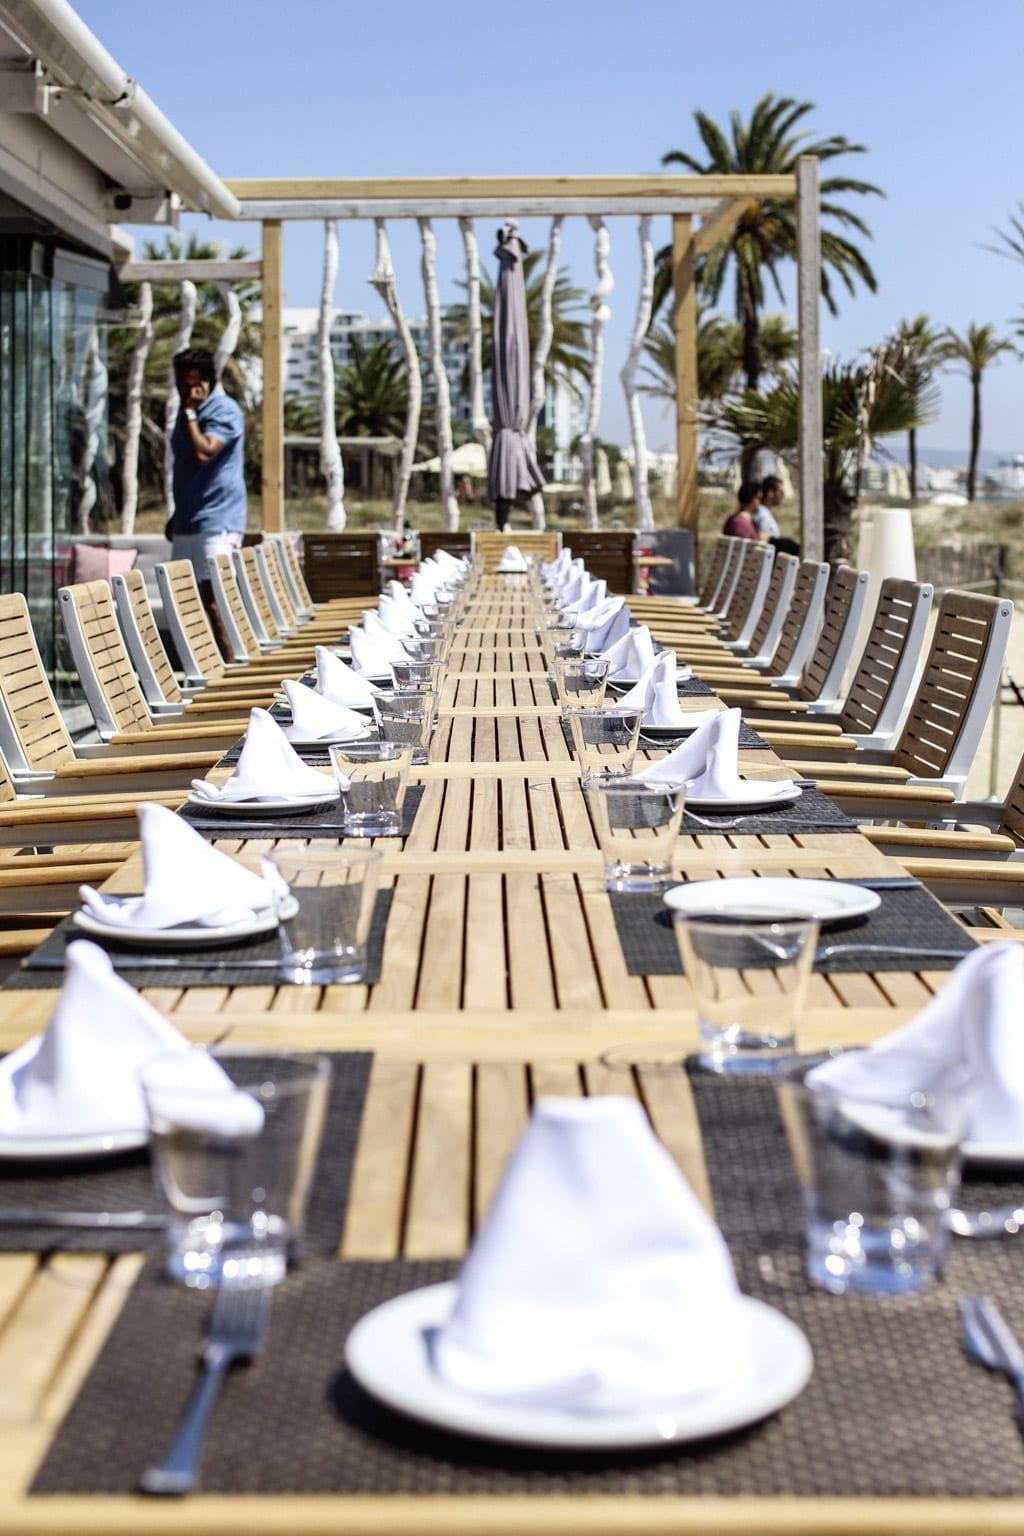 CK1605_Constantly-Nassau-Beach-Club-Ibiza-Spain-7819